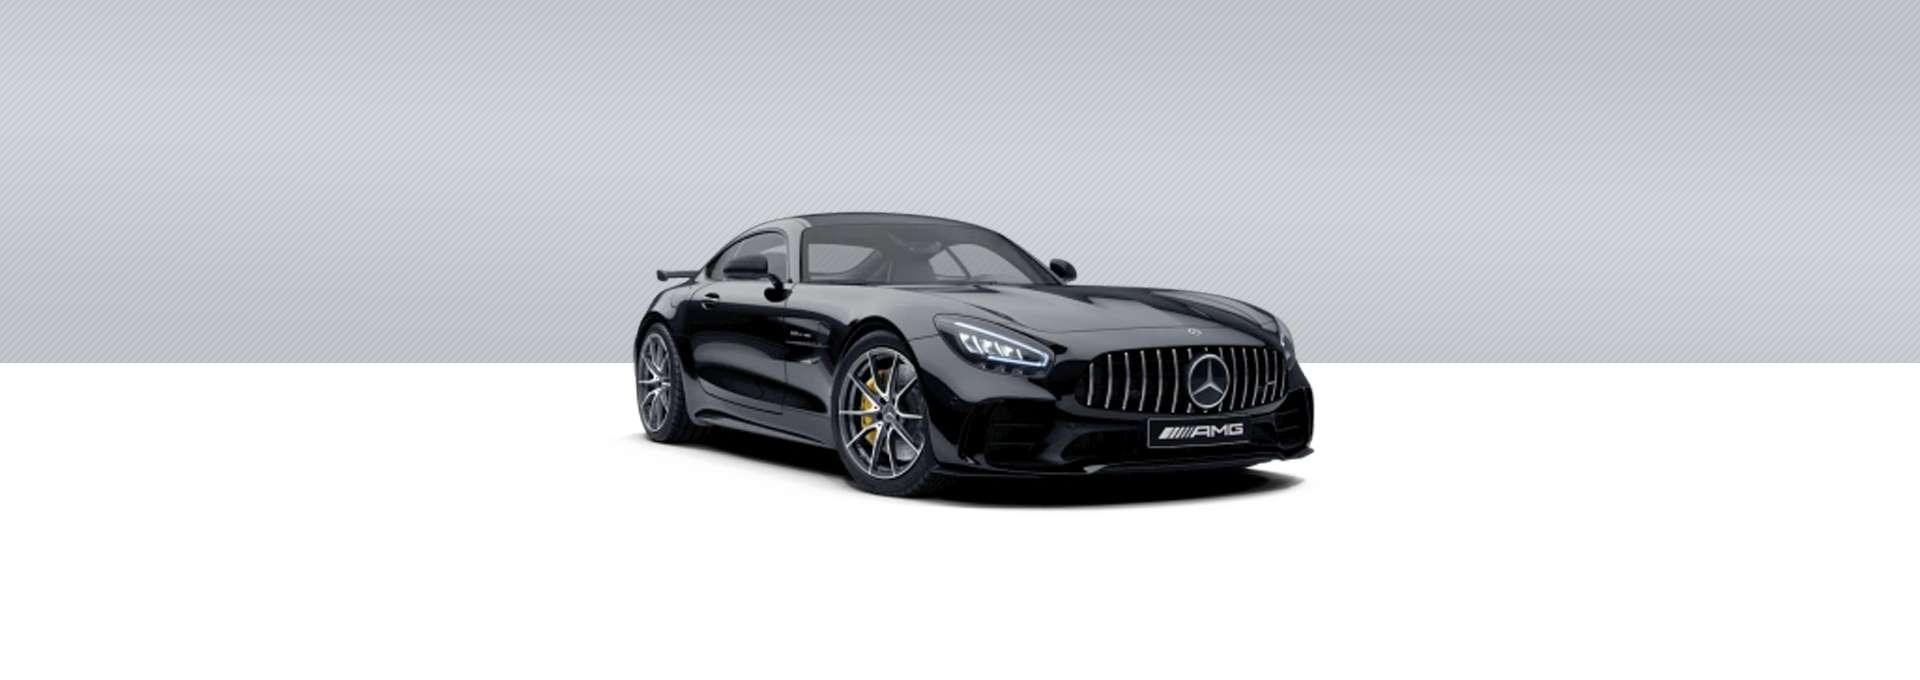 Mercedes Benz AMG GT COUPÉ